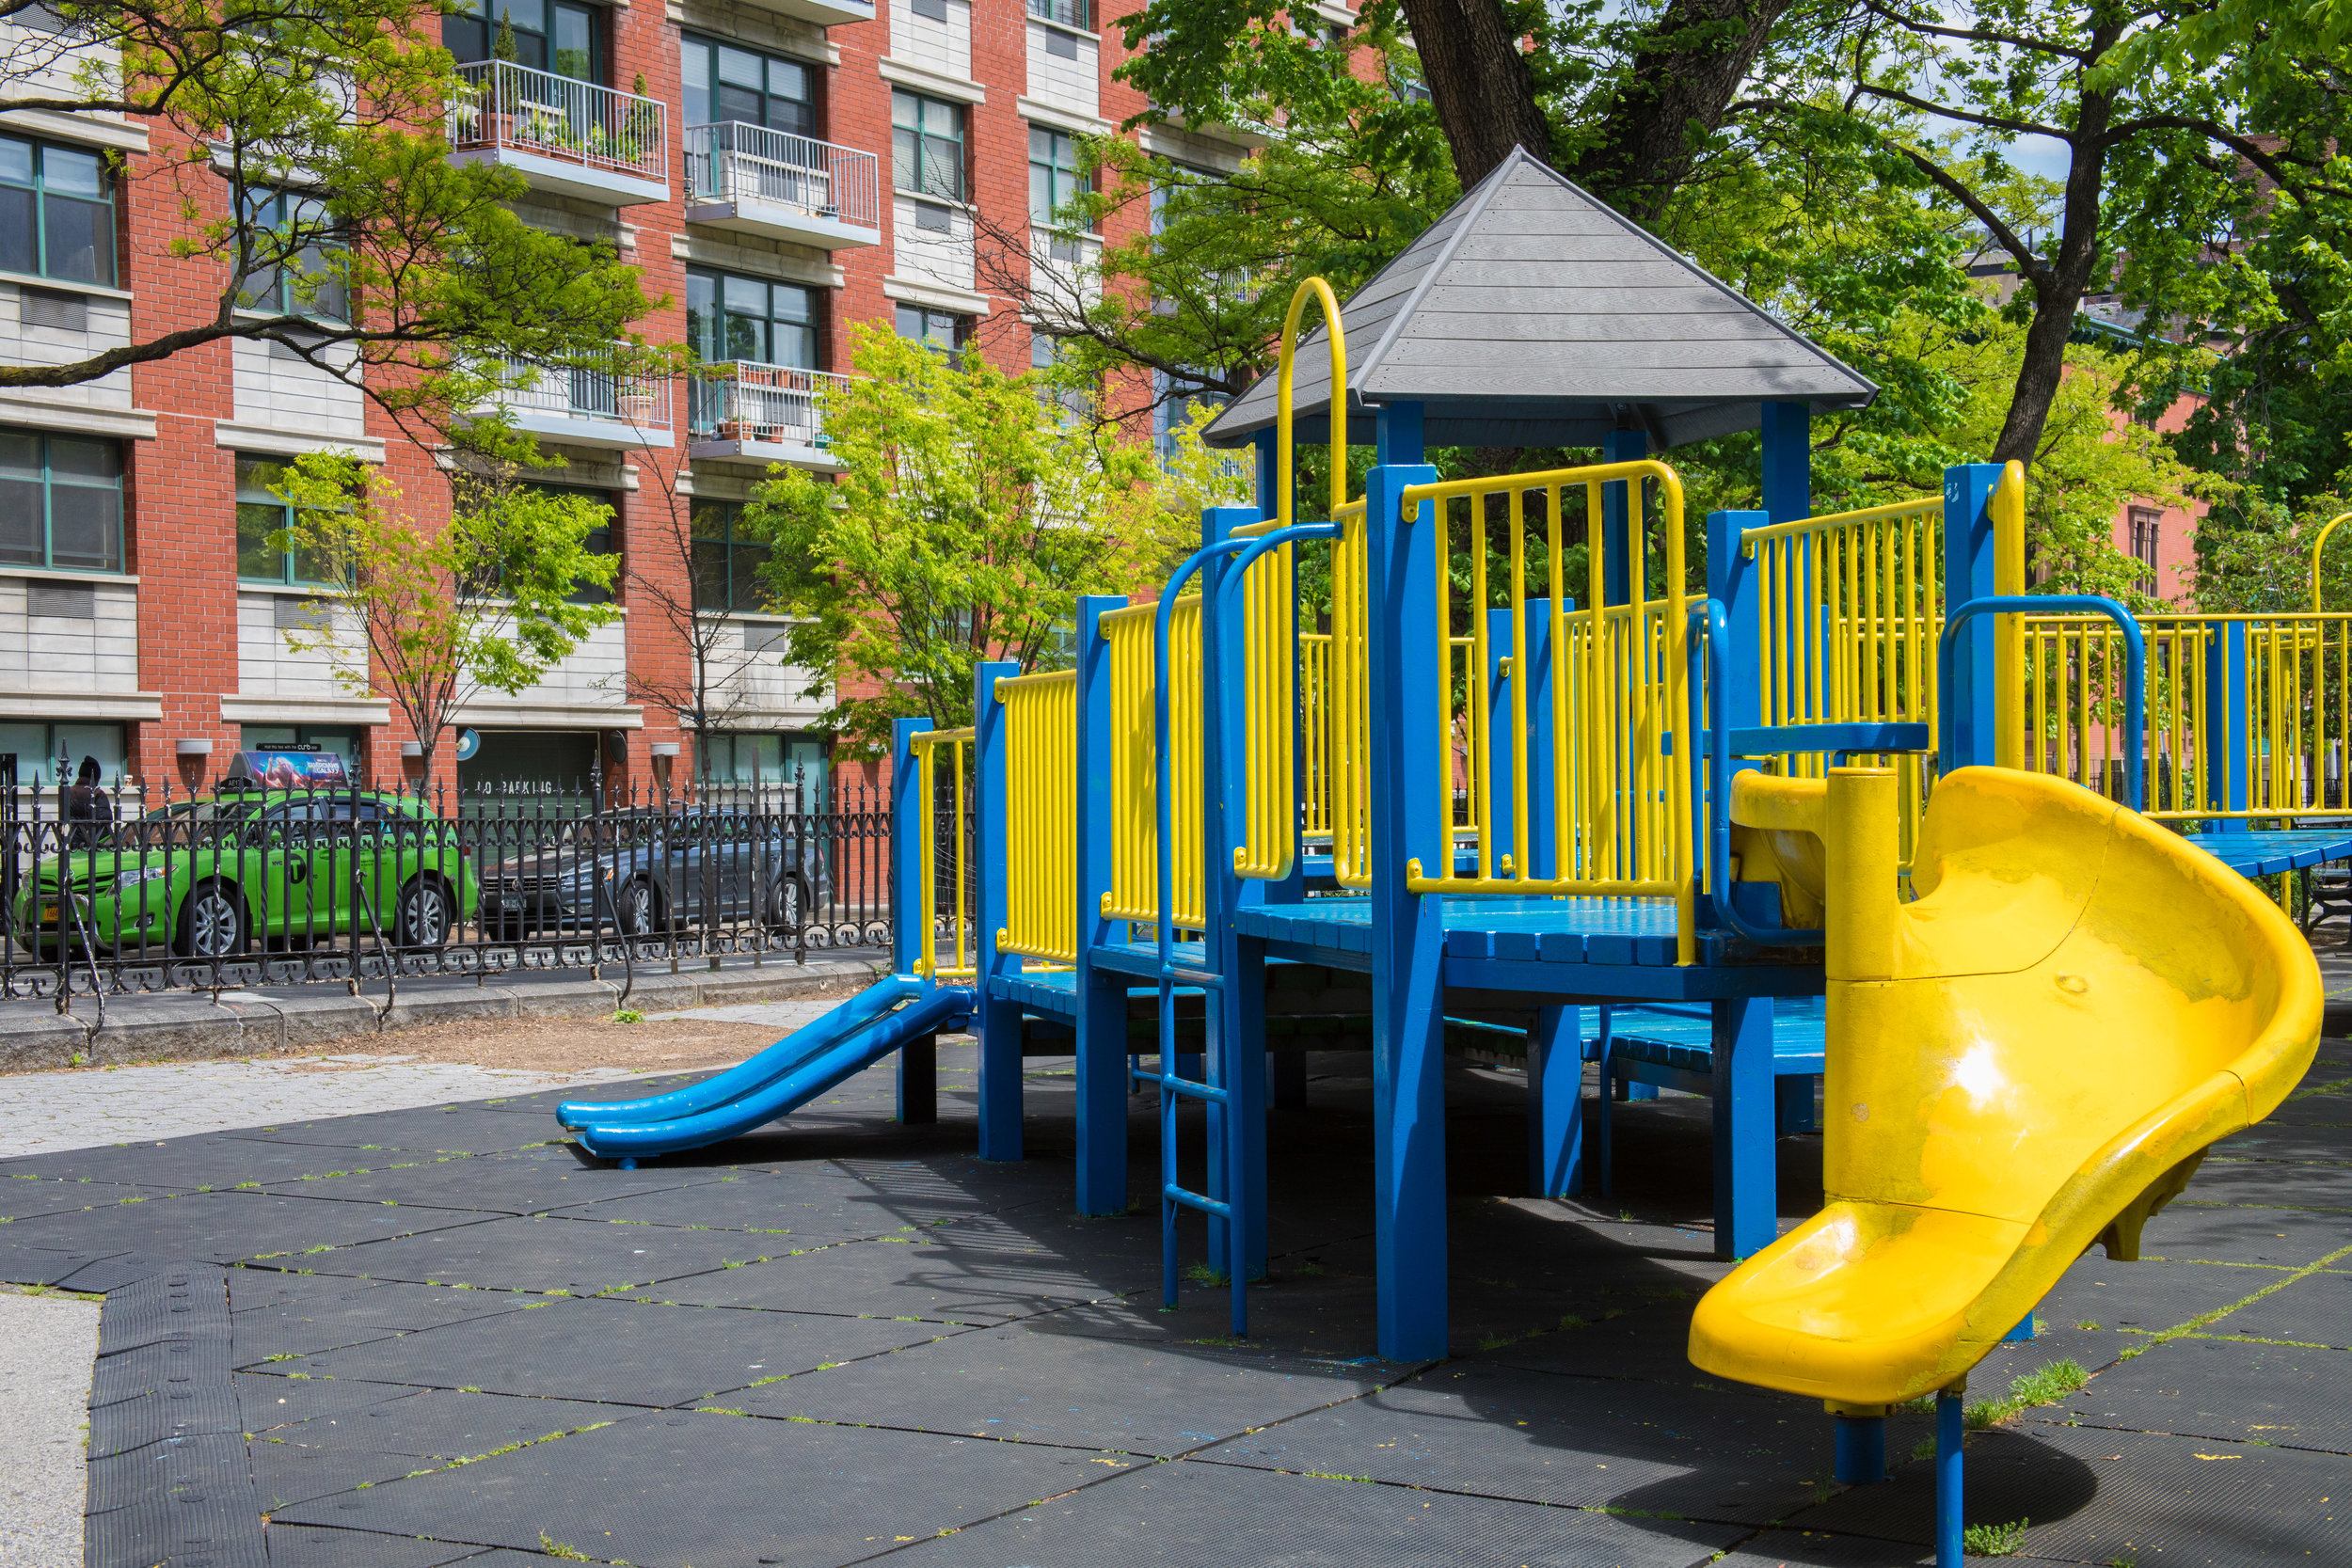 LSNY_Harlem-21.jpg